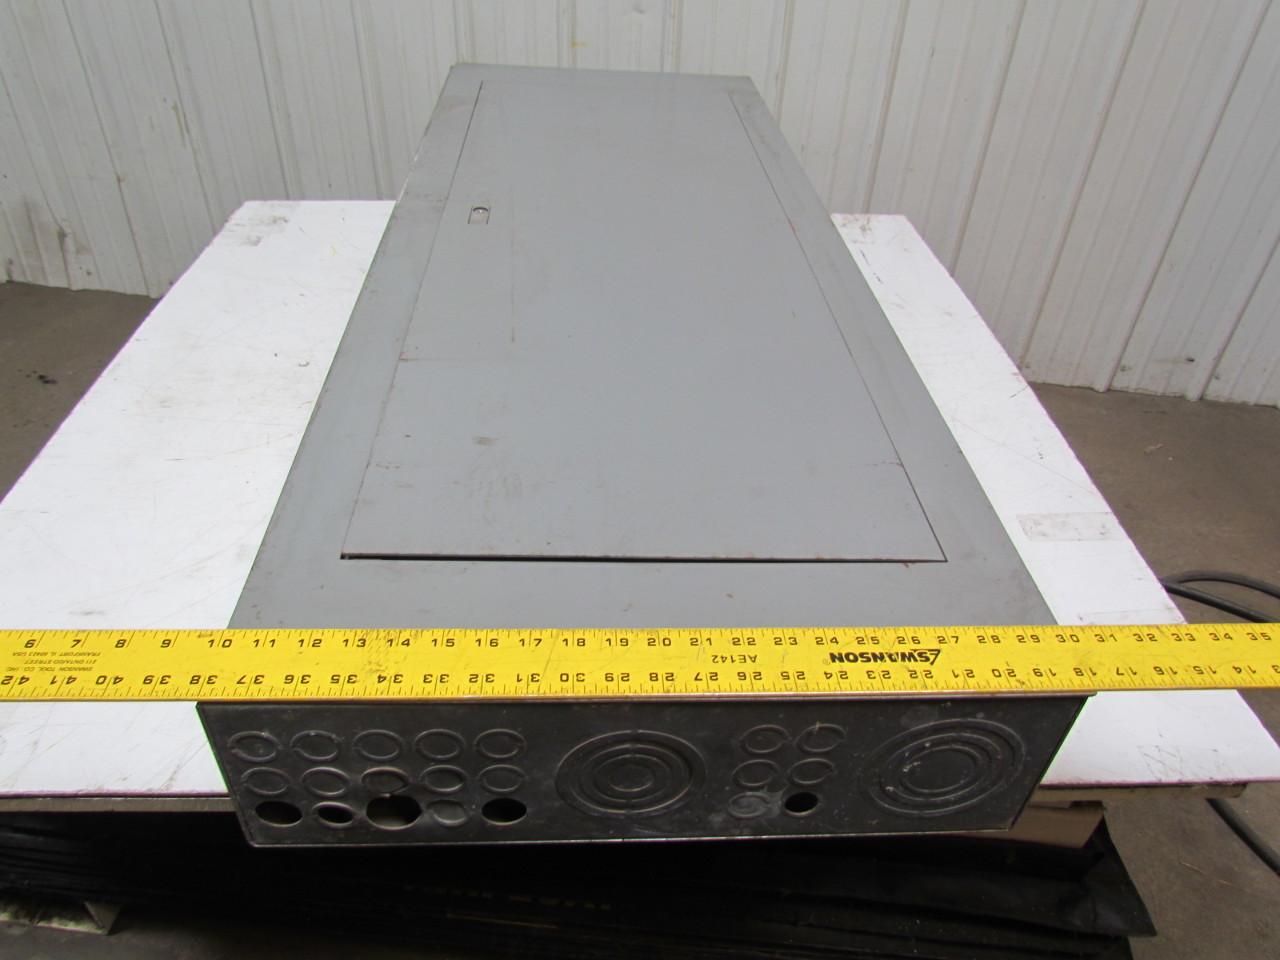 square d nqob 69663 1a 400a single phase 120v 240v 3 wire breaker panelboard ebay. Black Bedroom Furniture Sets. Home Design Ideas